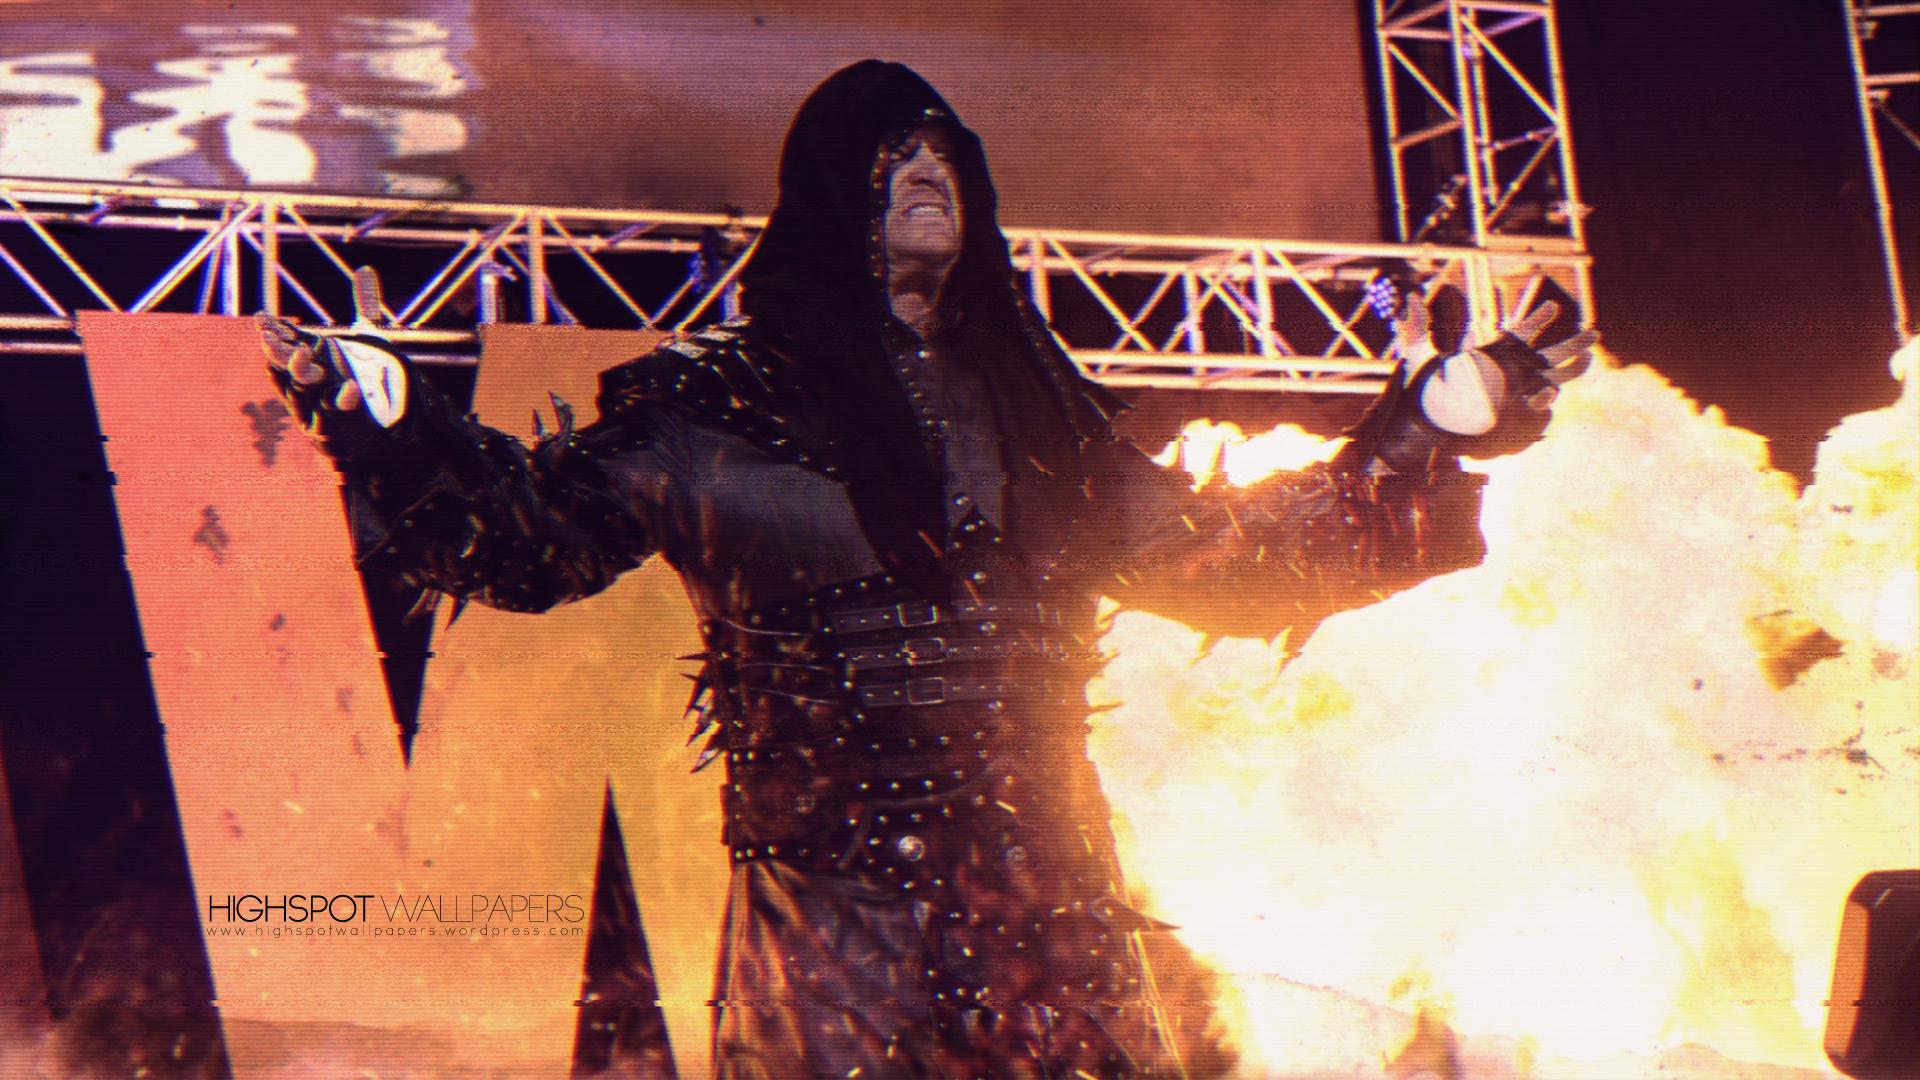 Batista Hd Wallpaper The Undertaker Wallpaper Highspot Wrestling Wallpapers